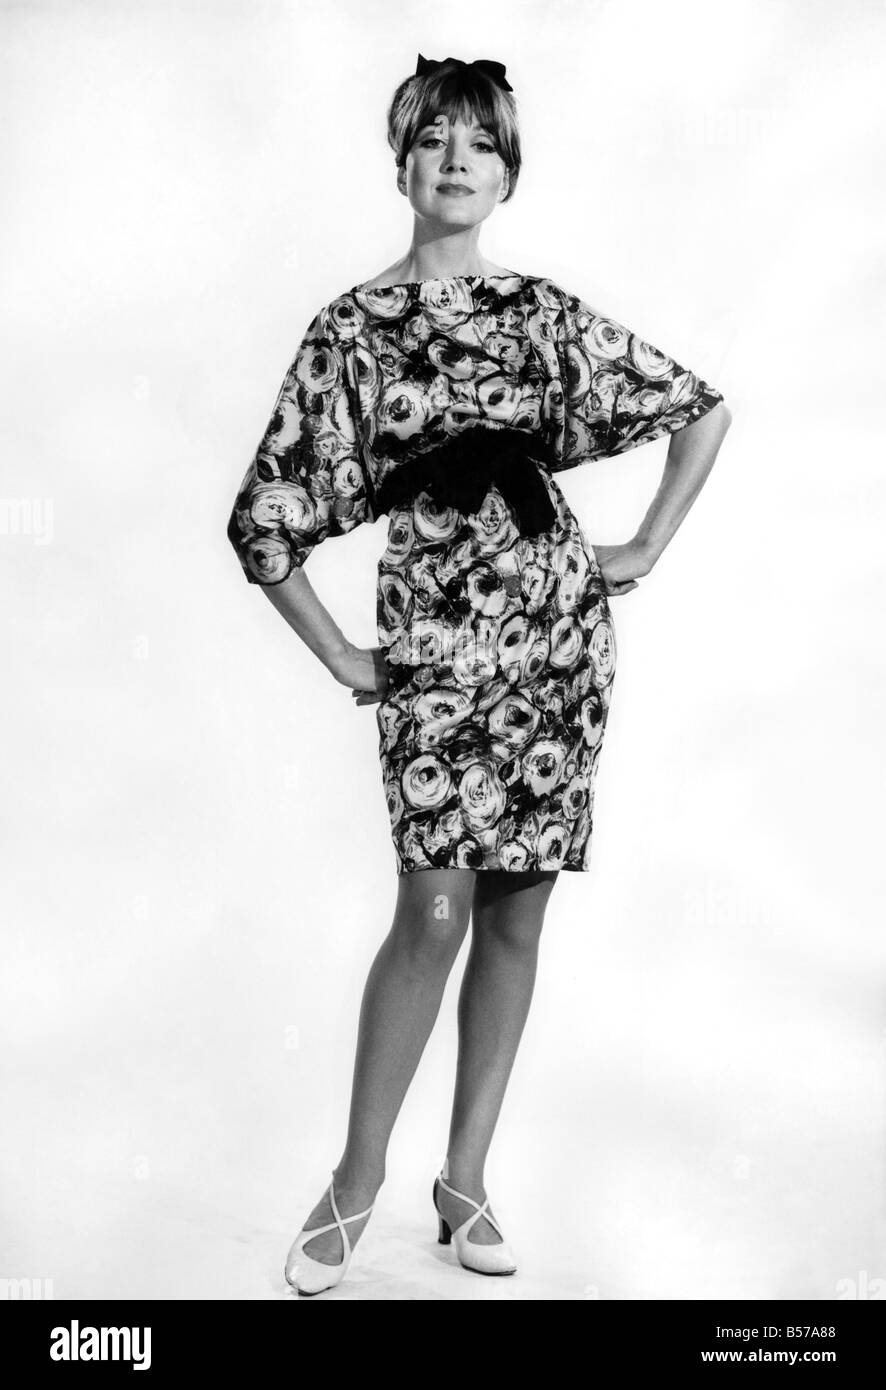 3dd760cf4a8 Reveille Fashions 1966: Anne Powell modelling summer dress. October ...